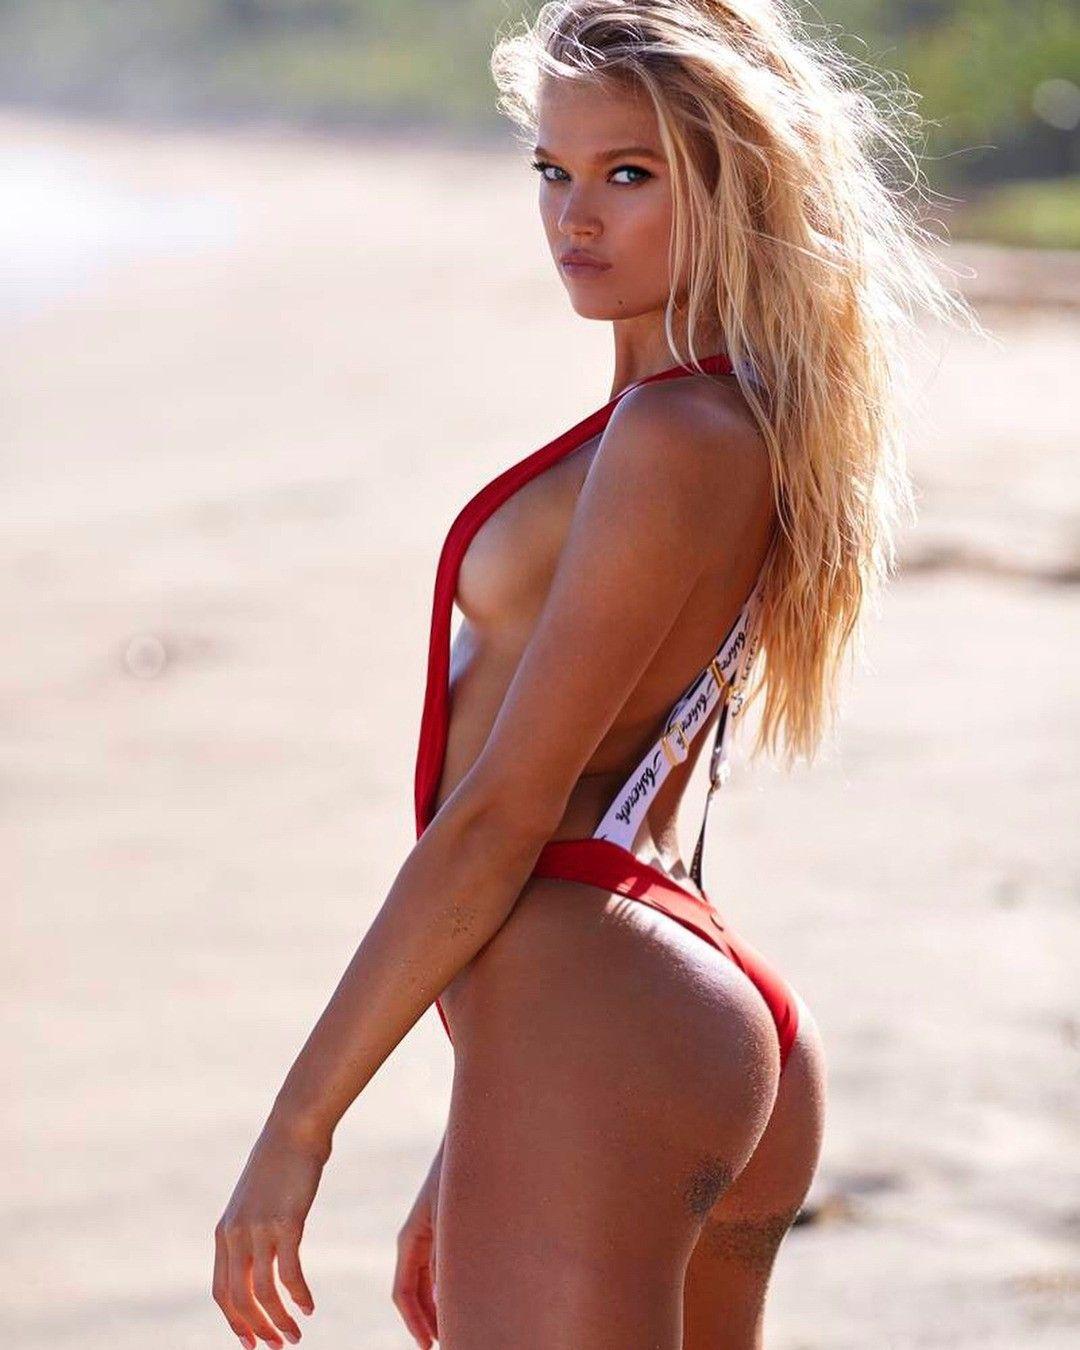 Young Vita Sidorkina-Morabito naked (12 photos), Sexy, Bikini, Boobs, cameltoe 2017